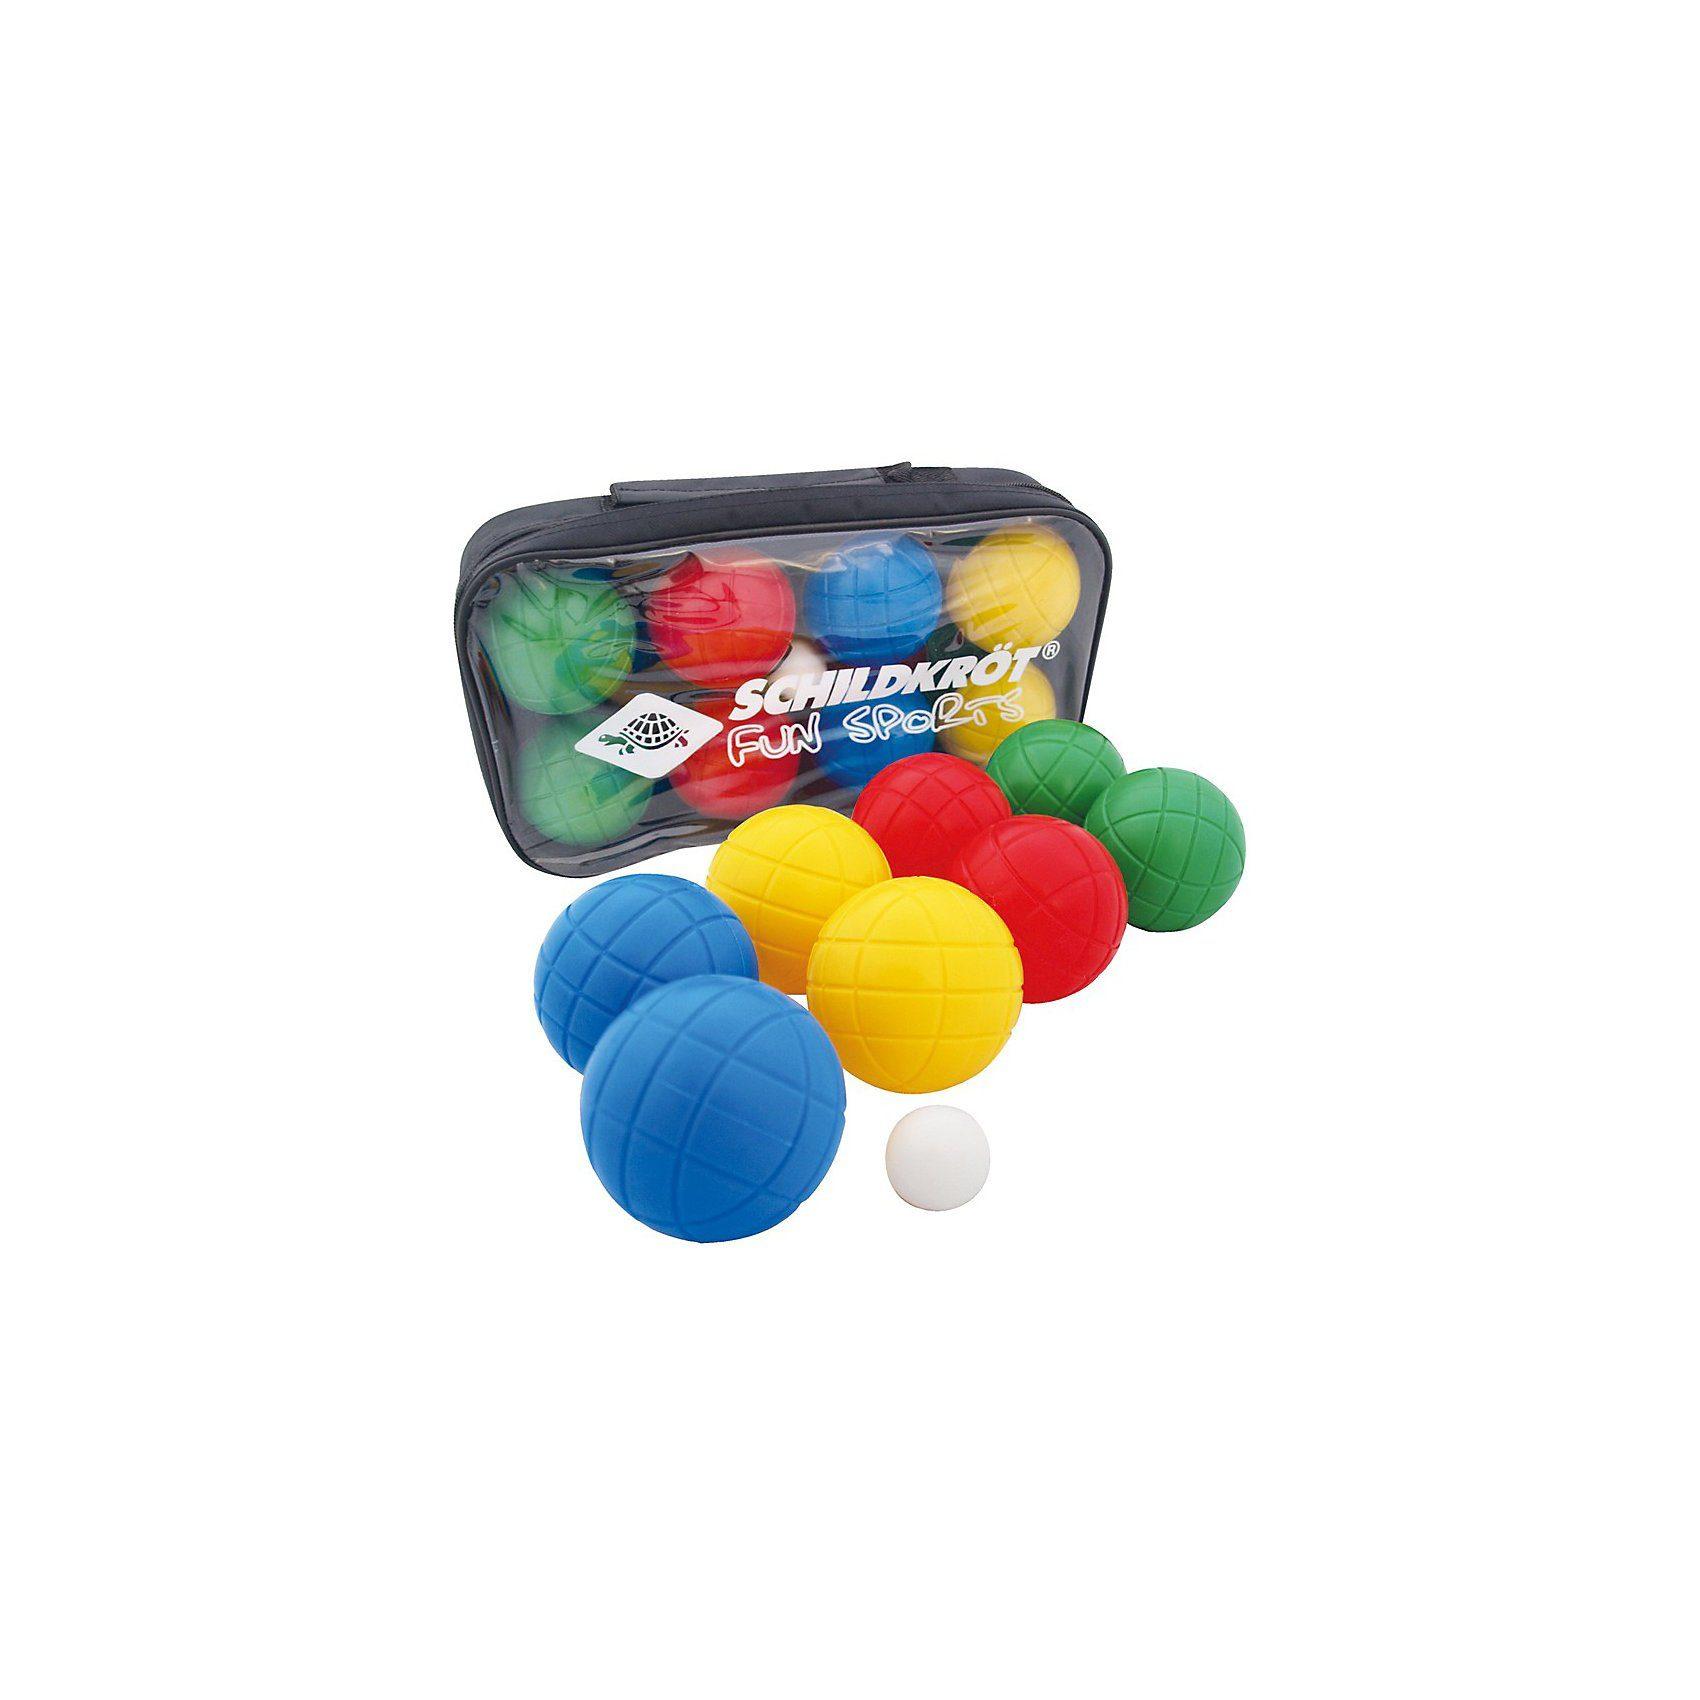 Schildkröt Funsports Fun Boccia Set